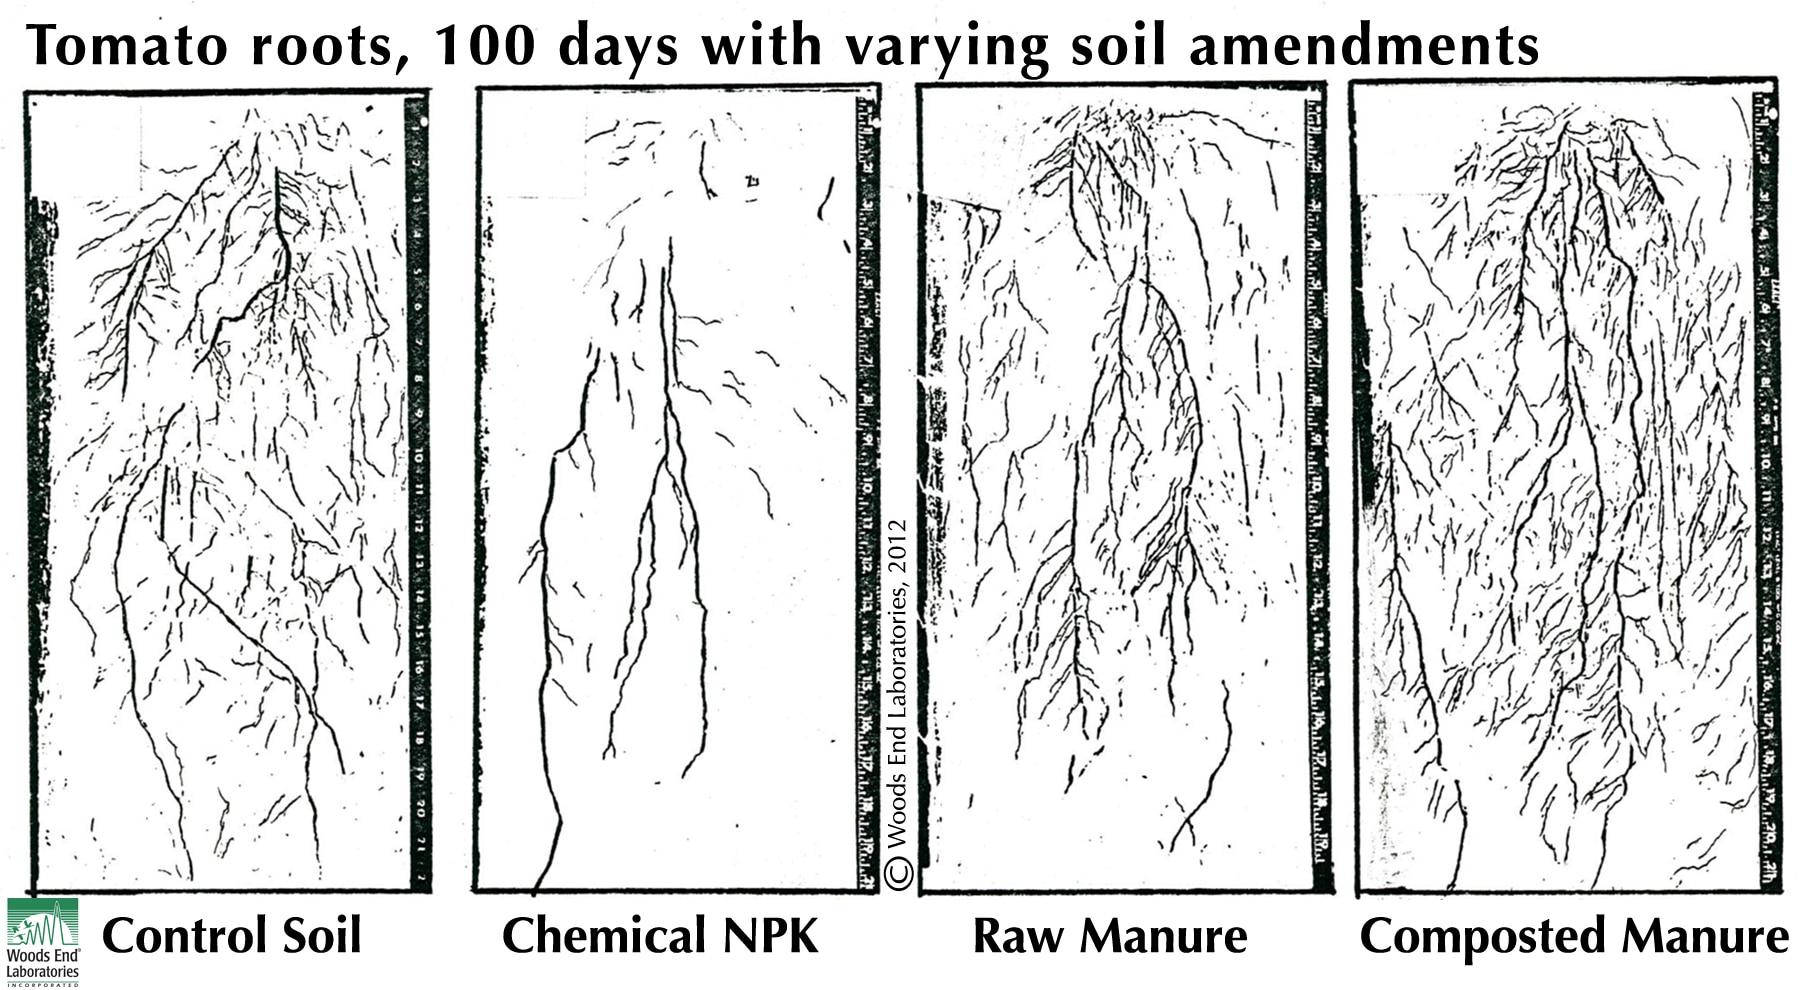 Soil Health: Amendments affect Whole Plant Morphology, Not just Yield